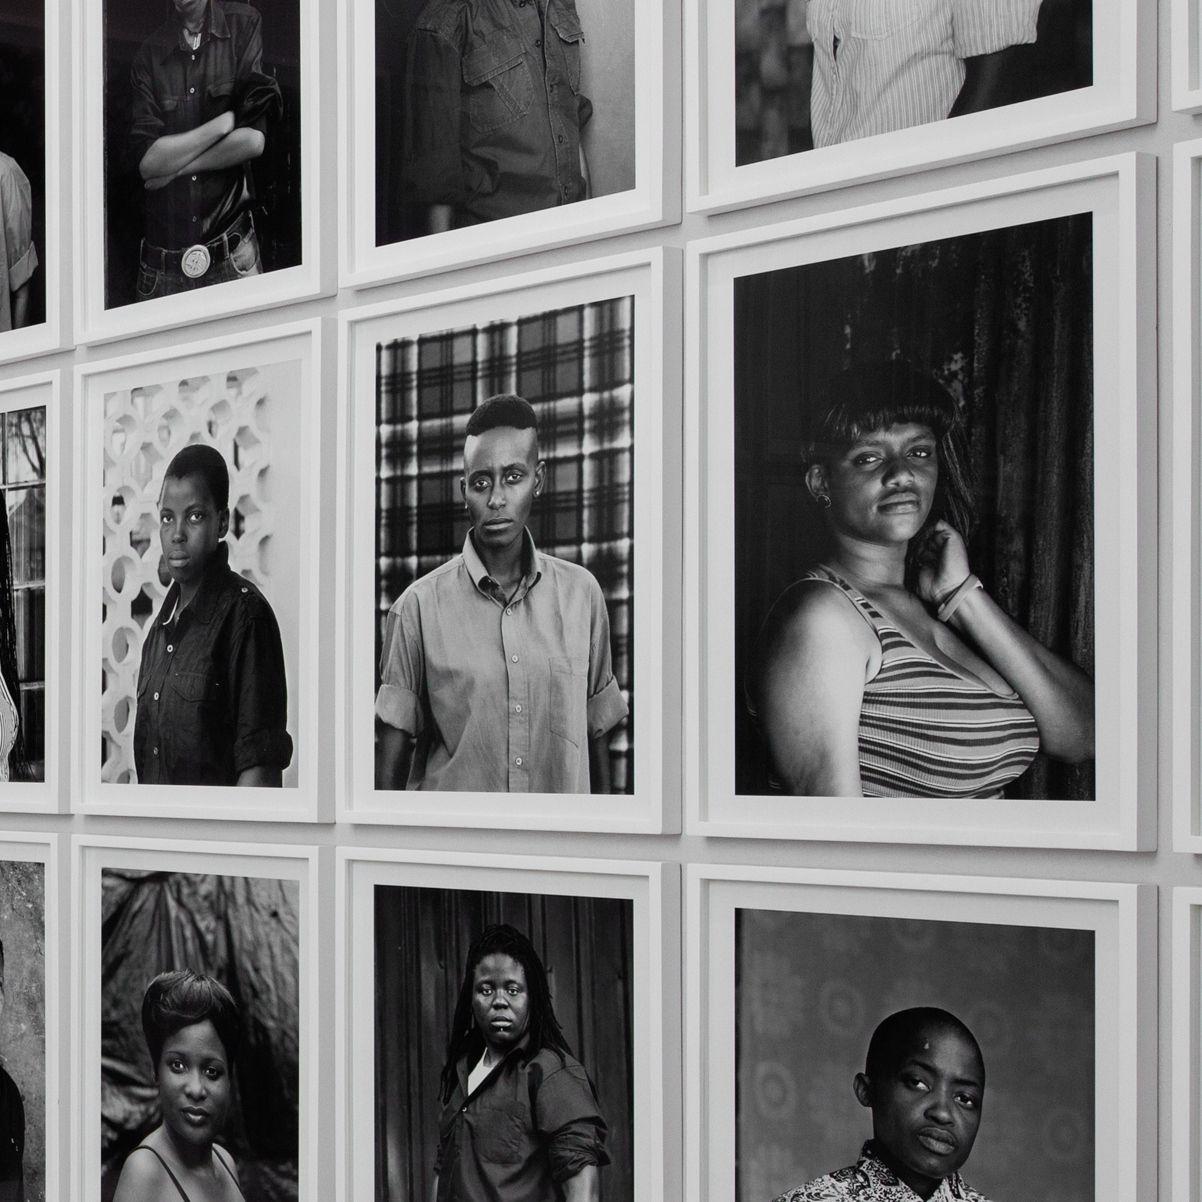 <p>Zanele Muholi (South African, b. 1972). <i>Faces and Phases</i> installed at dOCUMENTA (13), Kassel, Germany, 2012. (Photo: © Anders Sune Berg)</p>